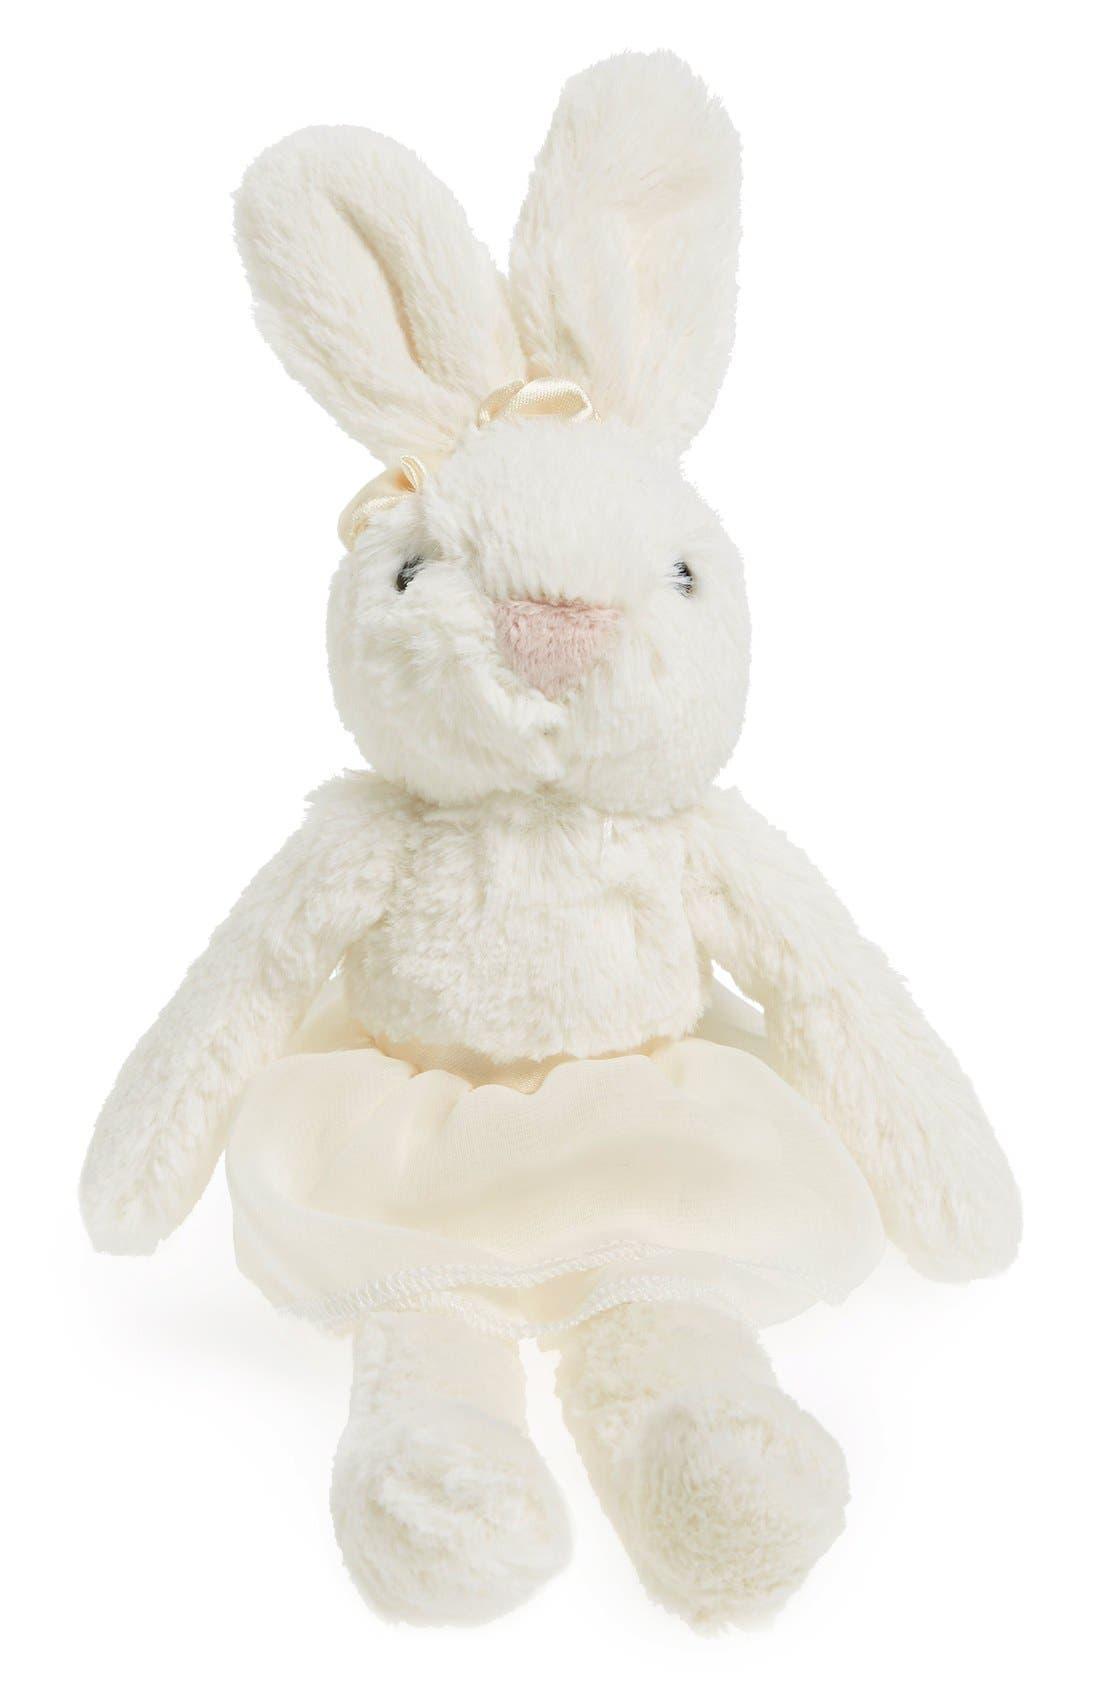 Main Image - Jellycat 'Plum Bunny' Stuffed Animal